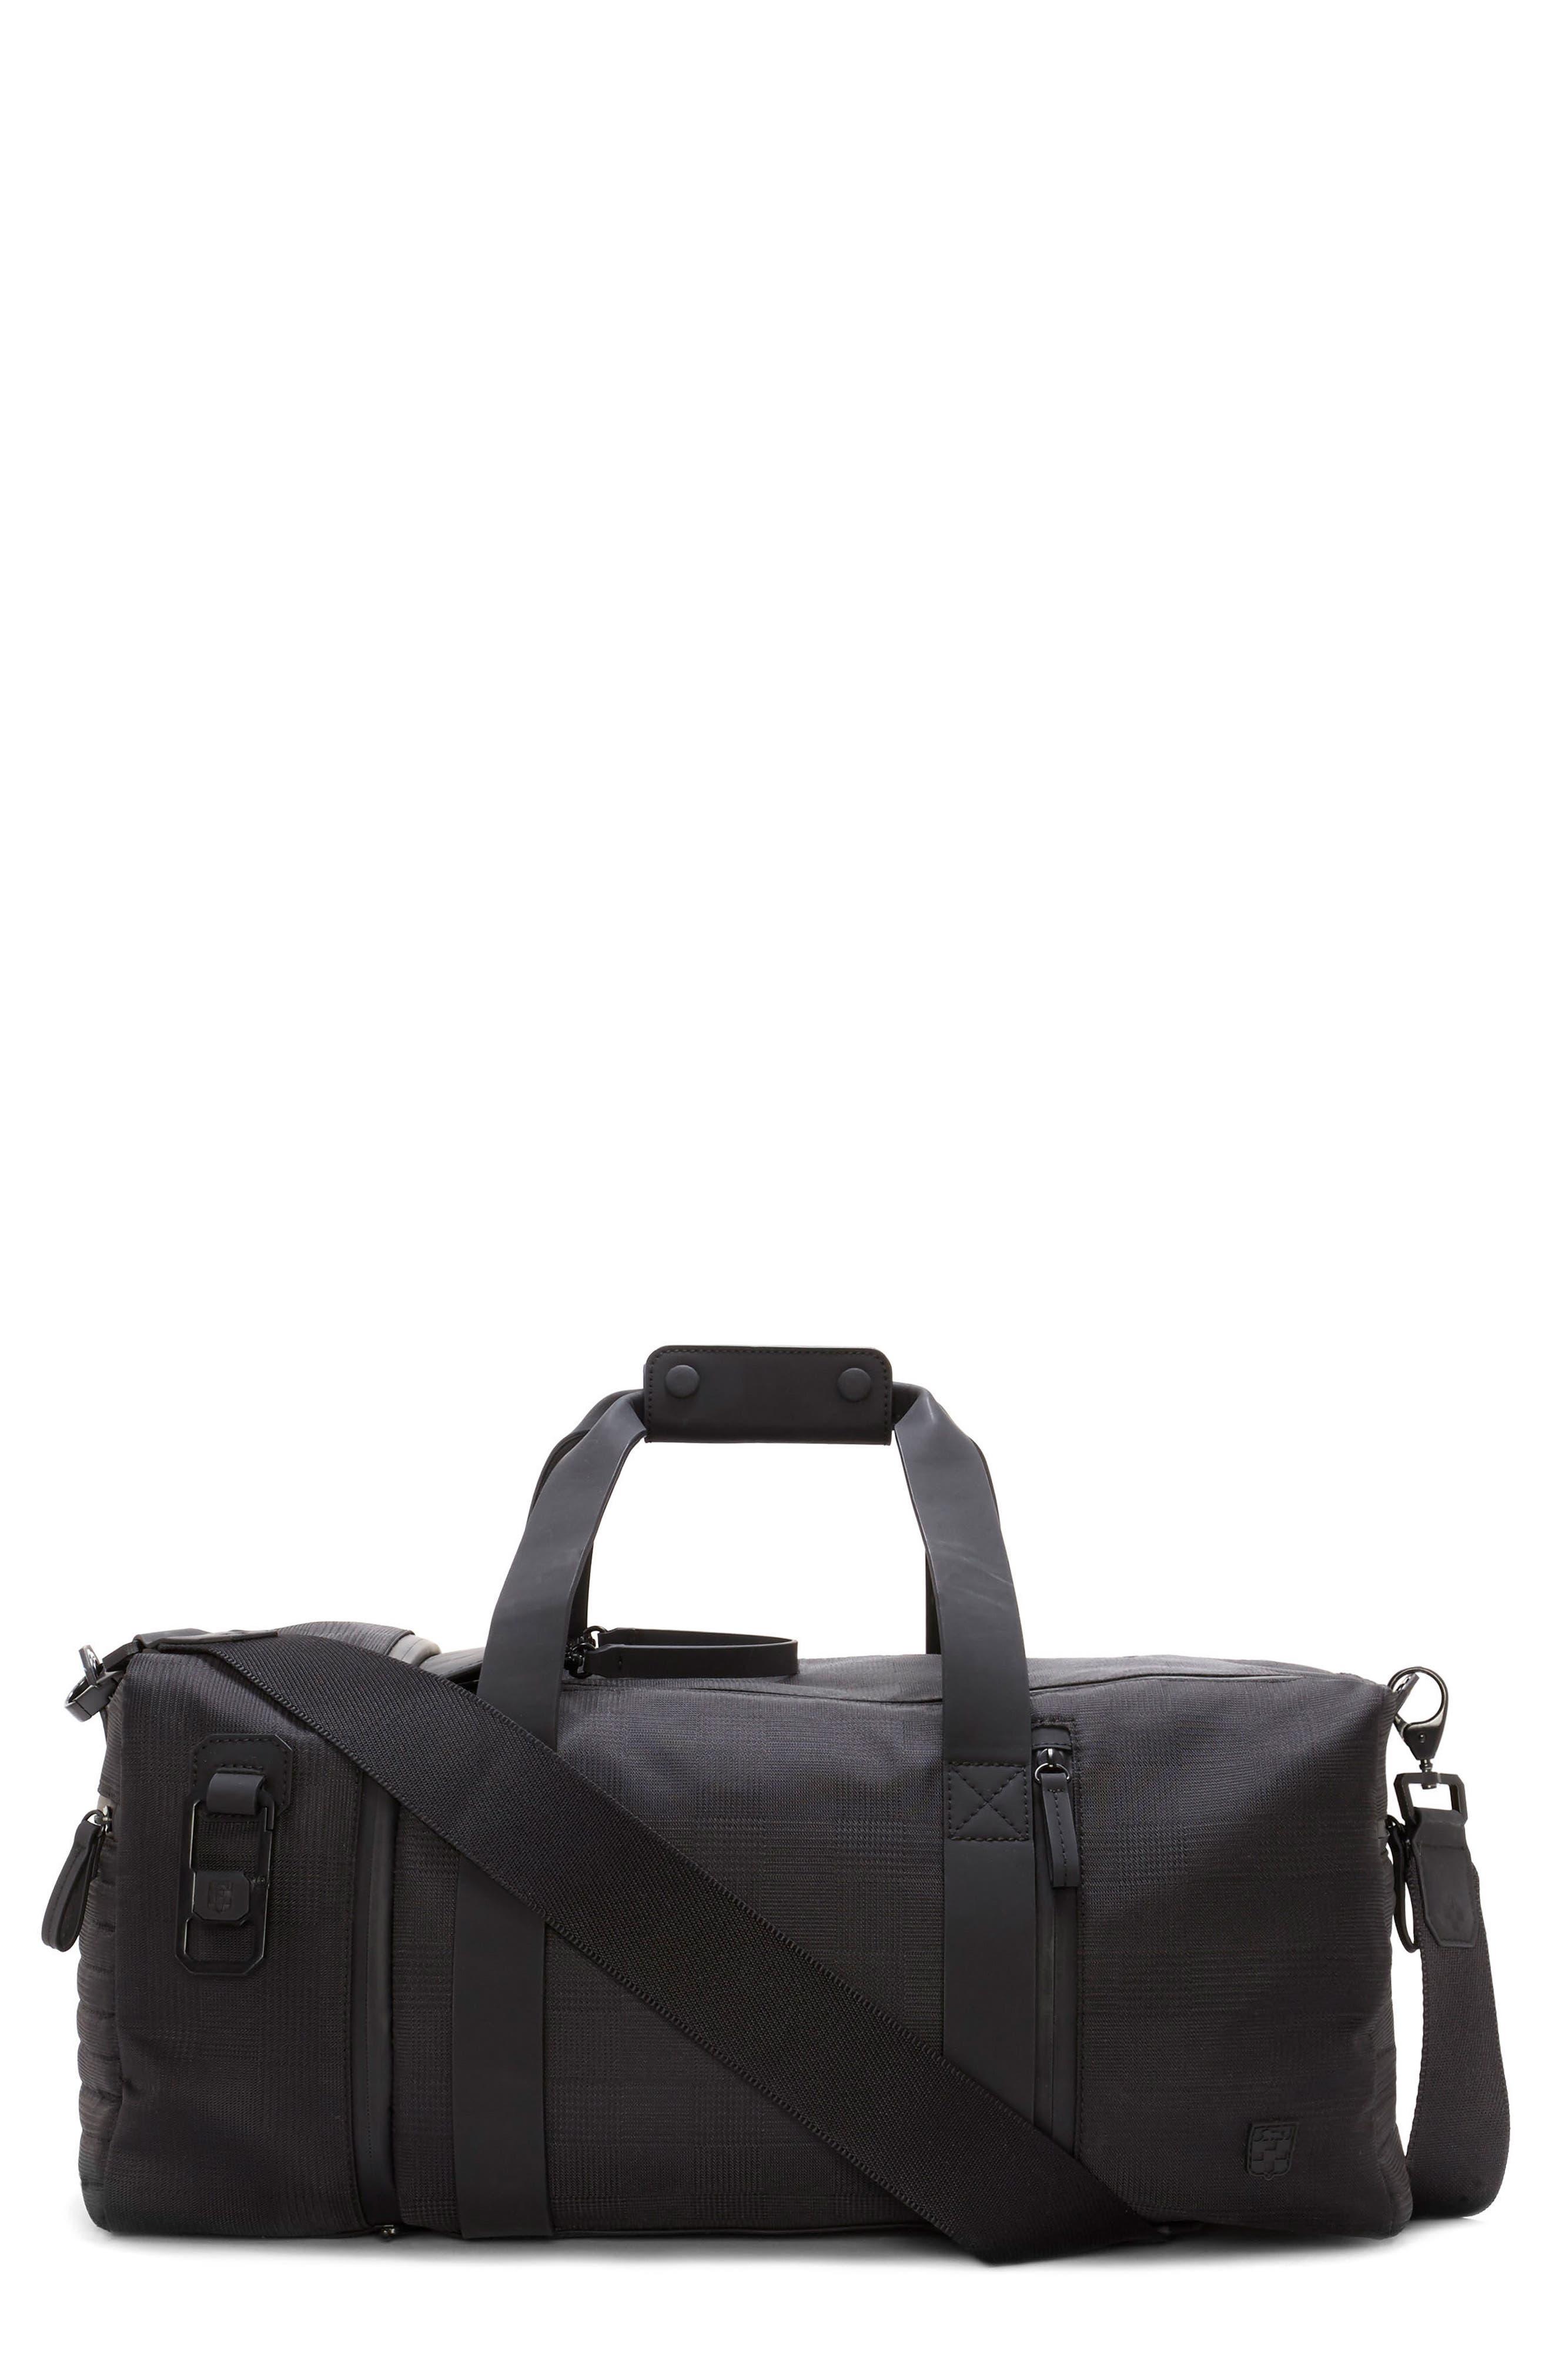 Race Duffel Bag,                         Main,                         color, 001